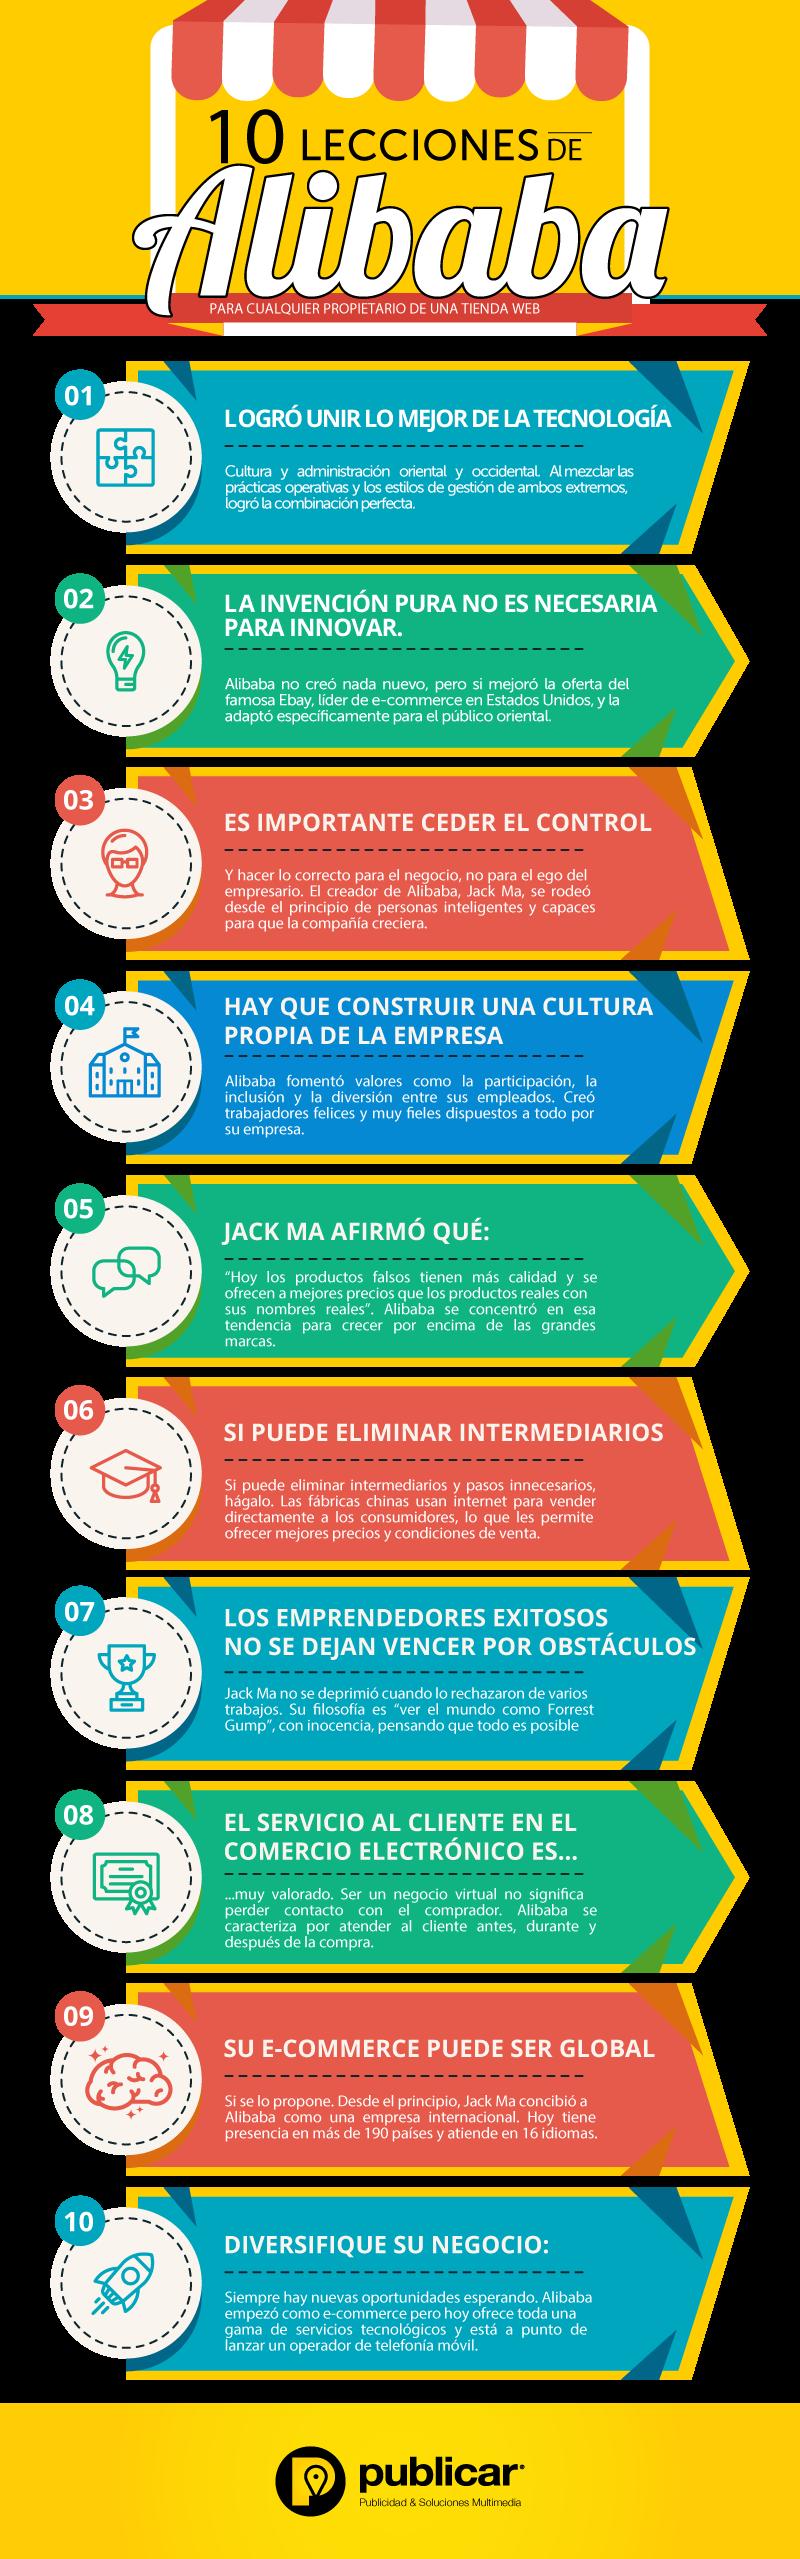 10 lecciones de Alibaba para tu Tienda Web #infografia #infographic #ecommerce